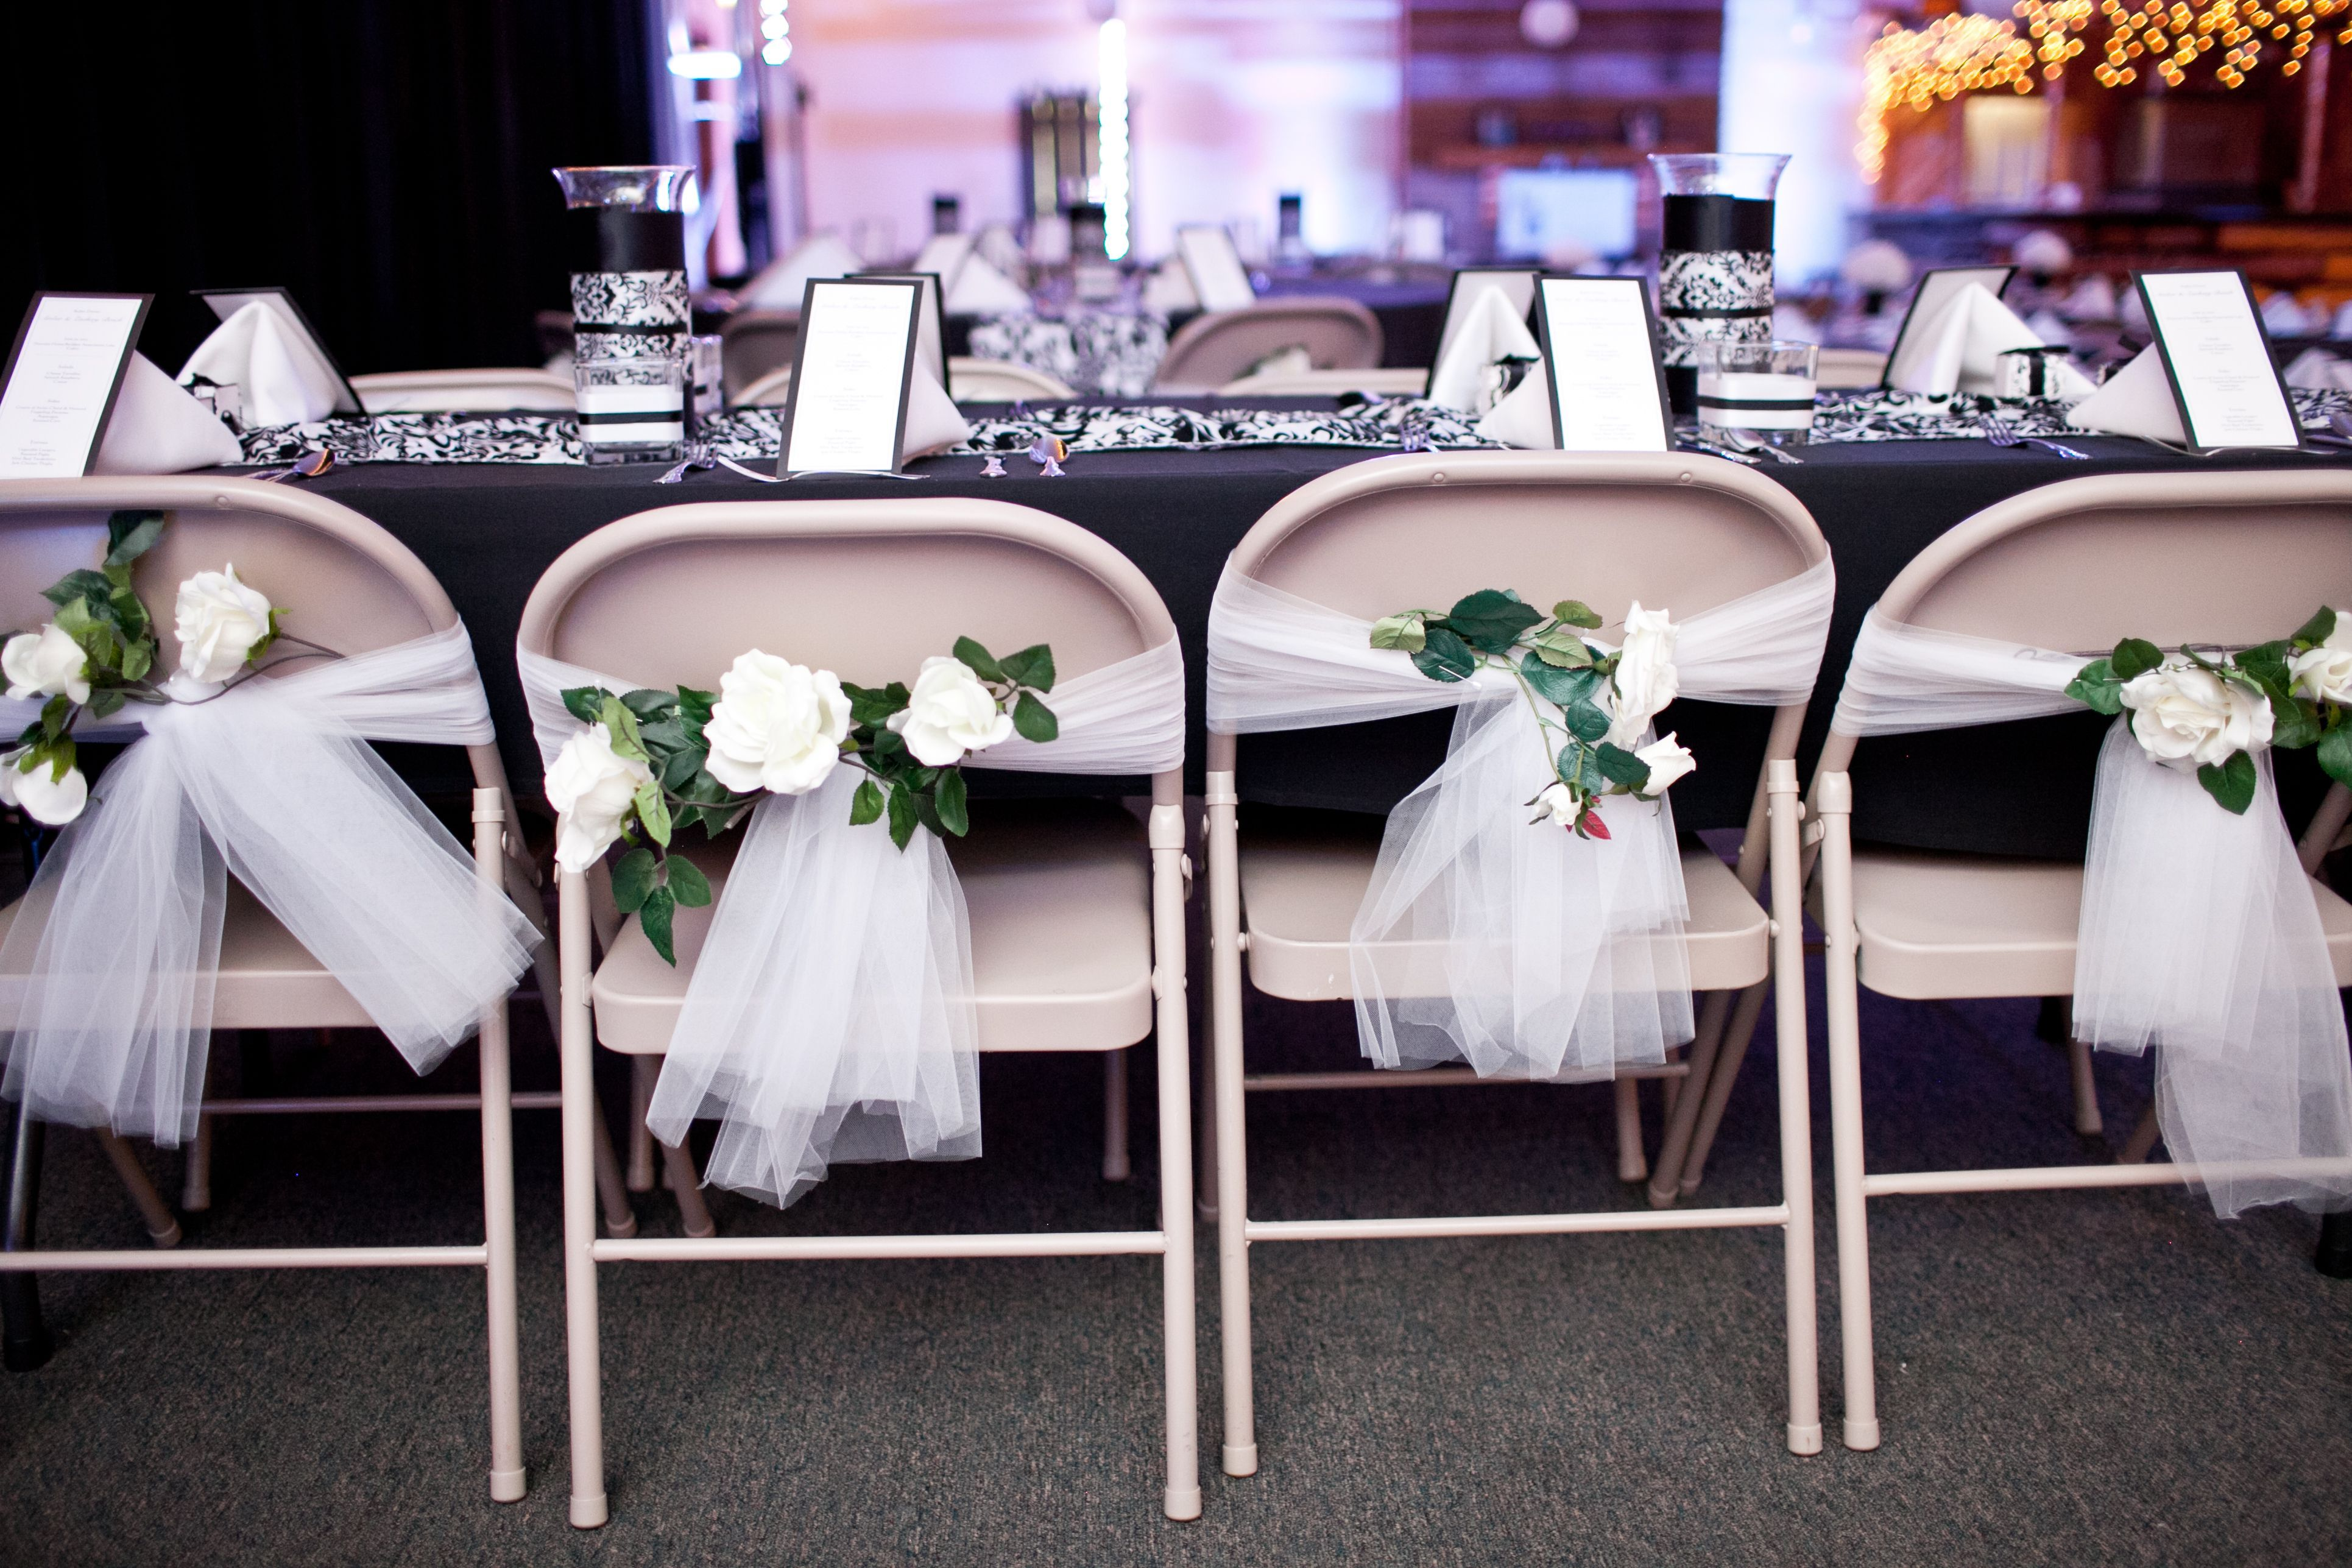 Wedding decorations to make  DoItYourself Wedding Chair Decorations  Make a Quick DIY Chair